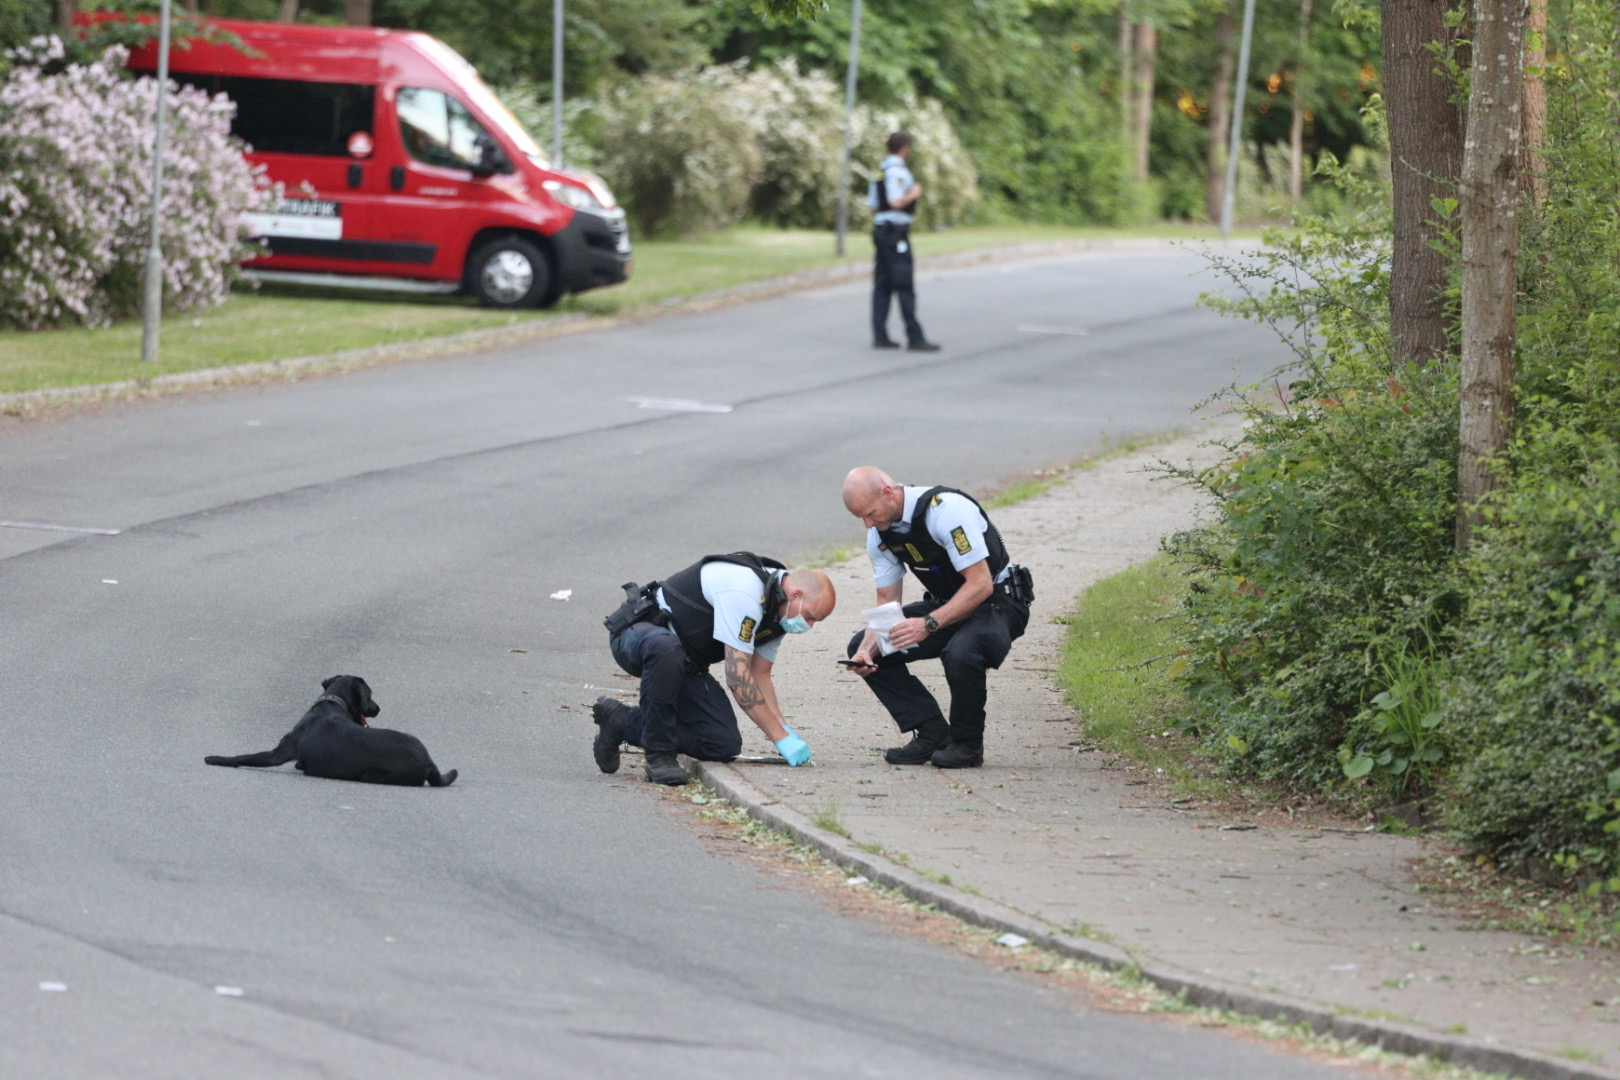 Større politiaktion i Vejlby-Risskov